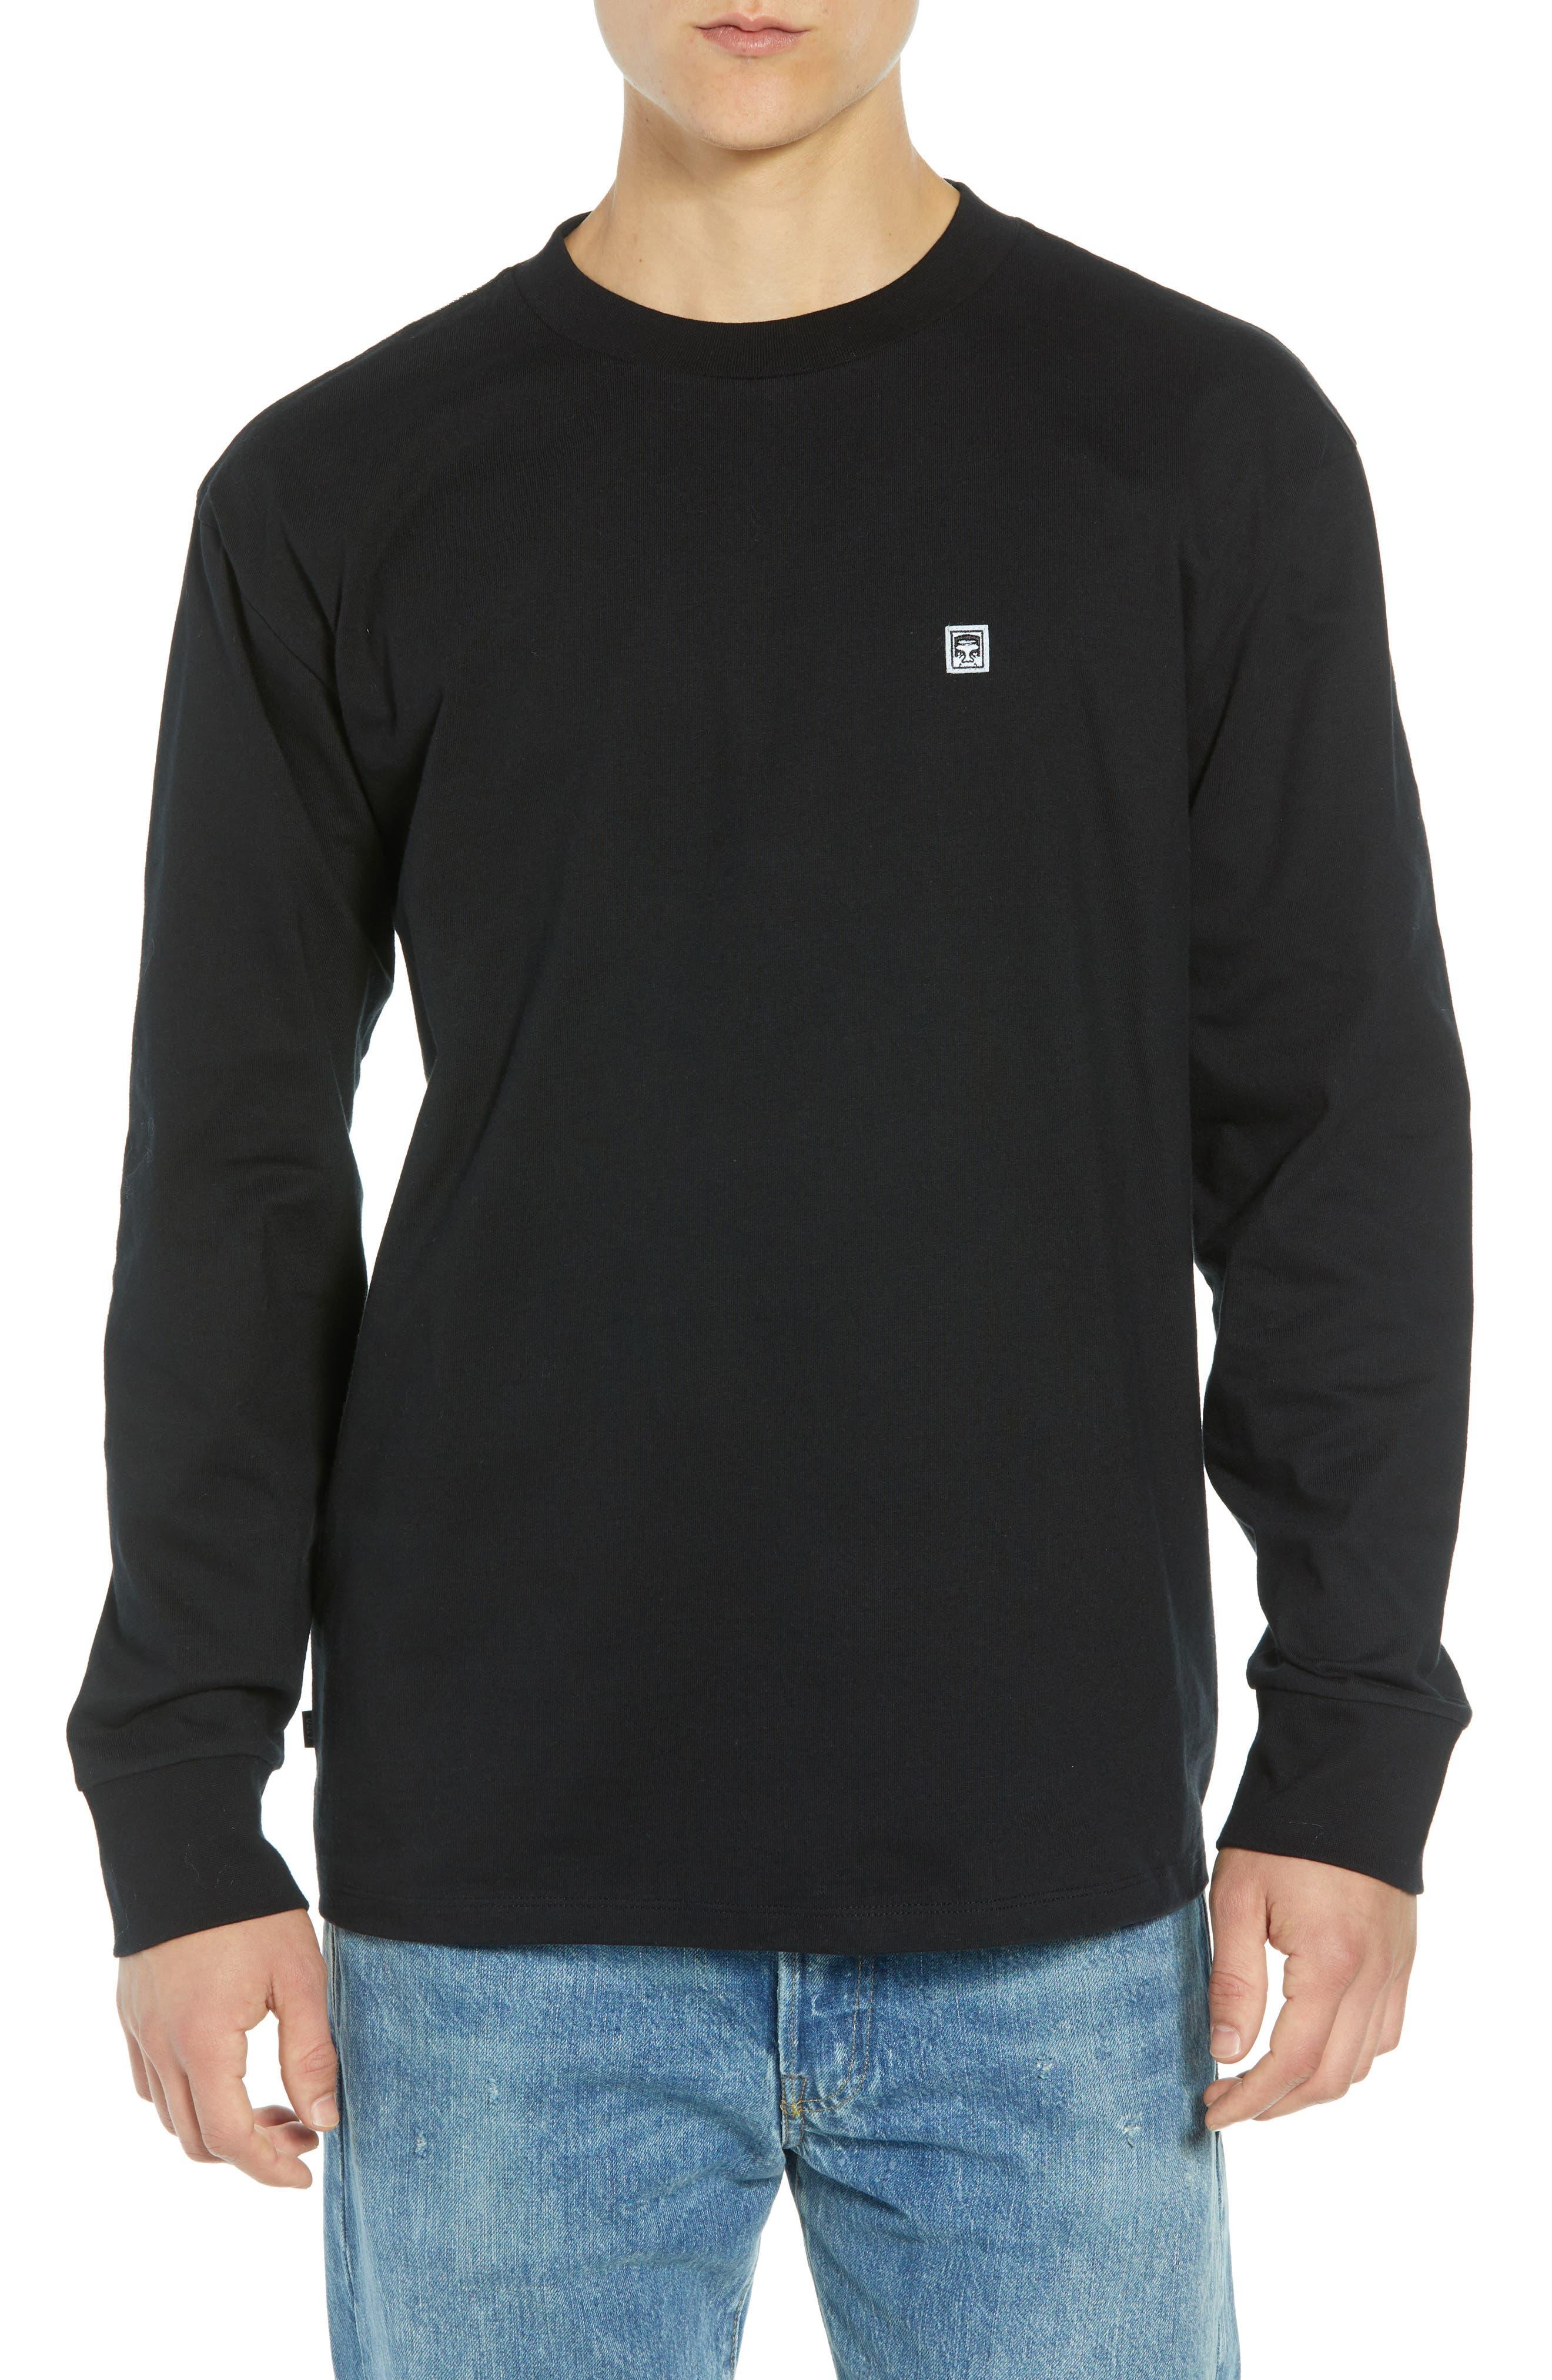 Eighty-Nine Solid Box Long Sleeve T-Shirt,                             Main thumbnail 1, color,                             BLACK MULTI